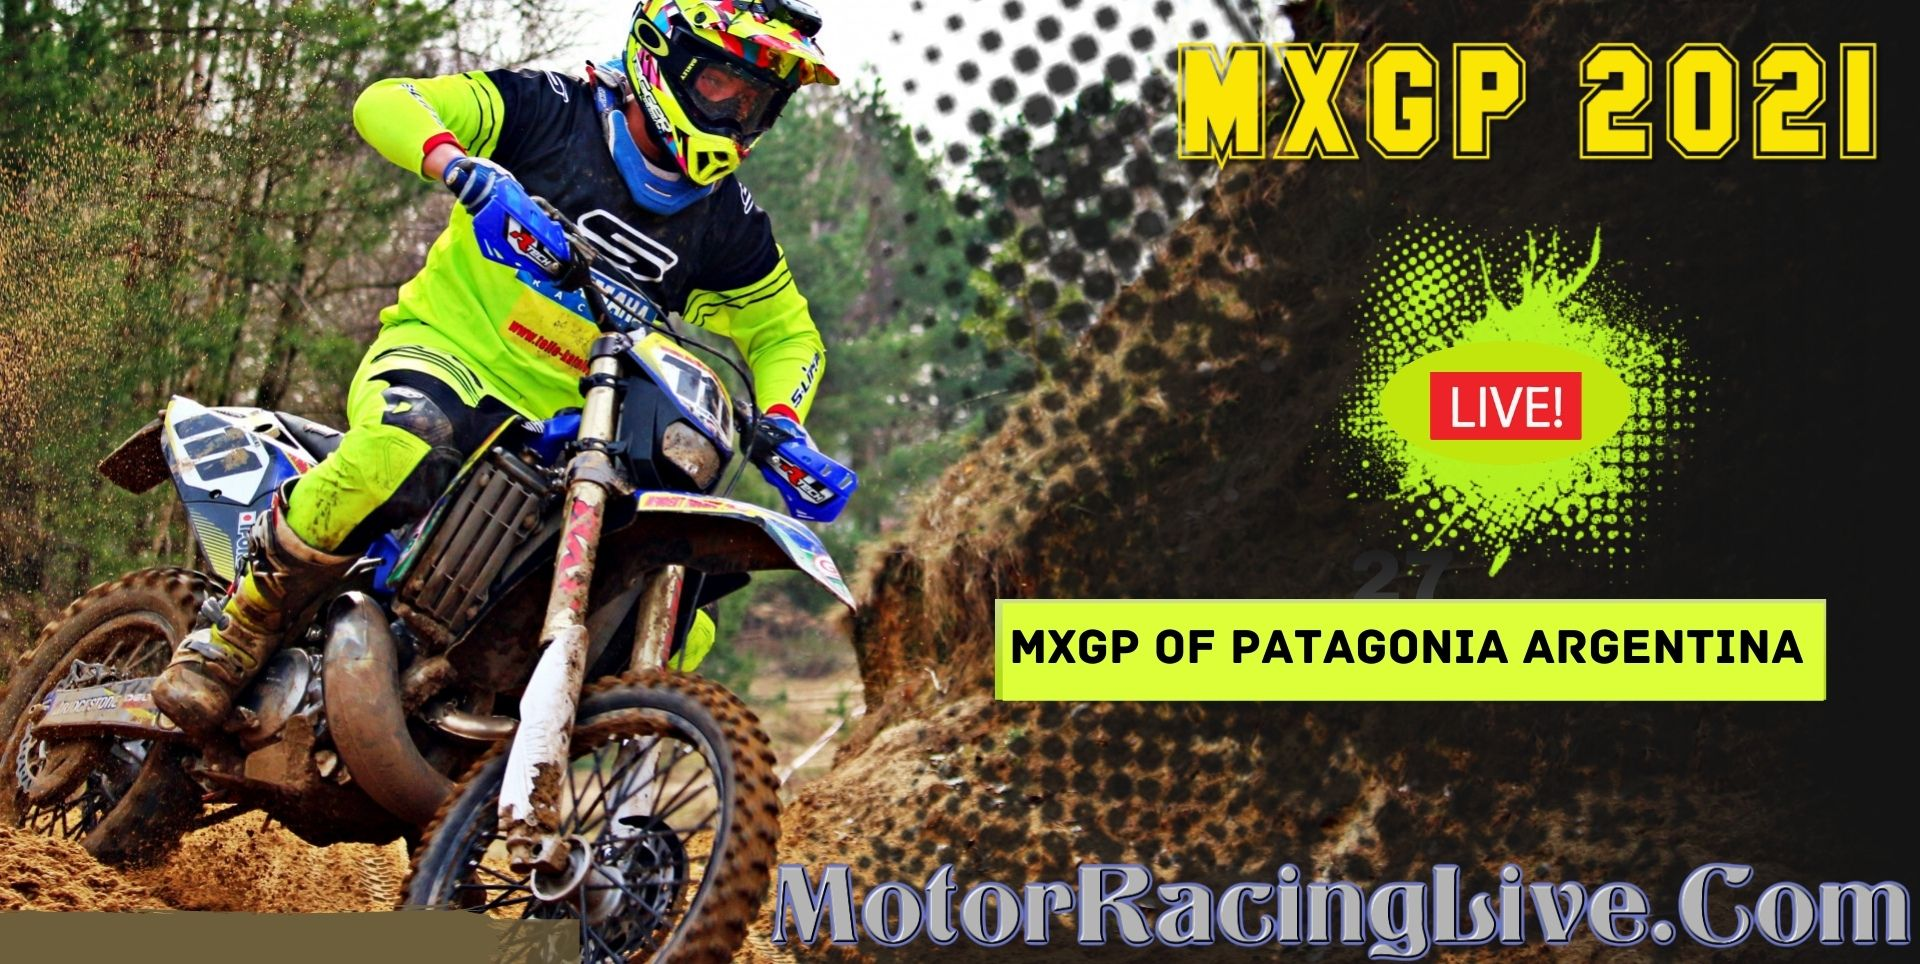 MXGP OF PATAGONIA ARGENTINA 2021 Live Stream